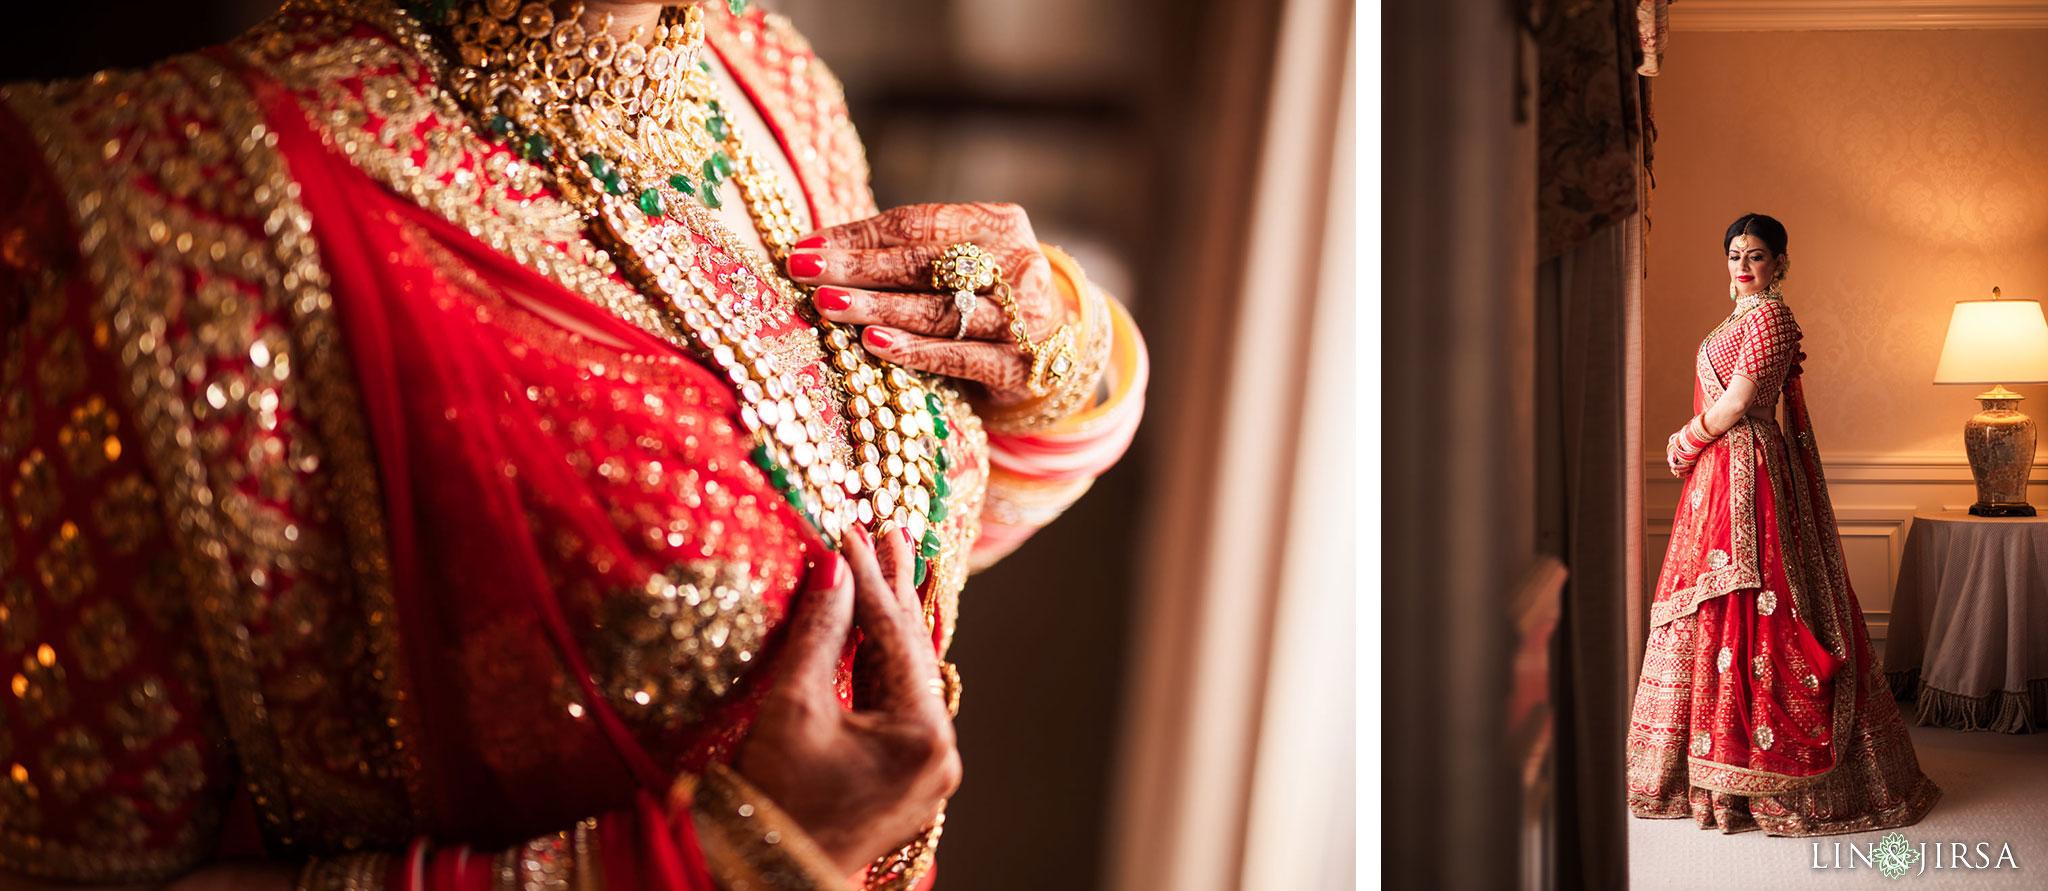 12 Ritz Carlton St Louis Missouri Indian Wedding Photography